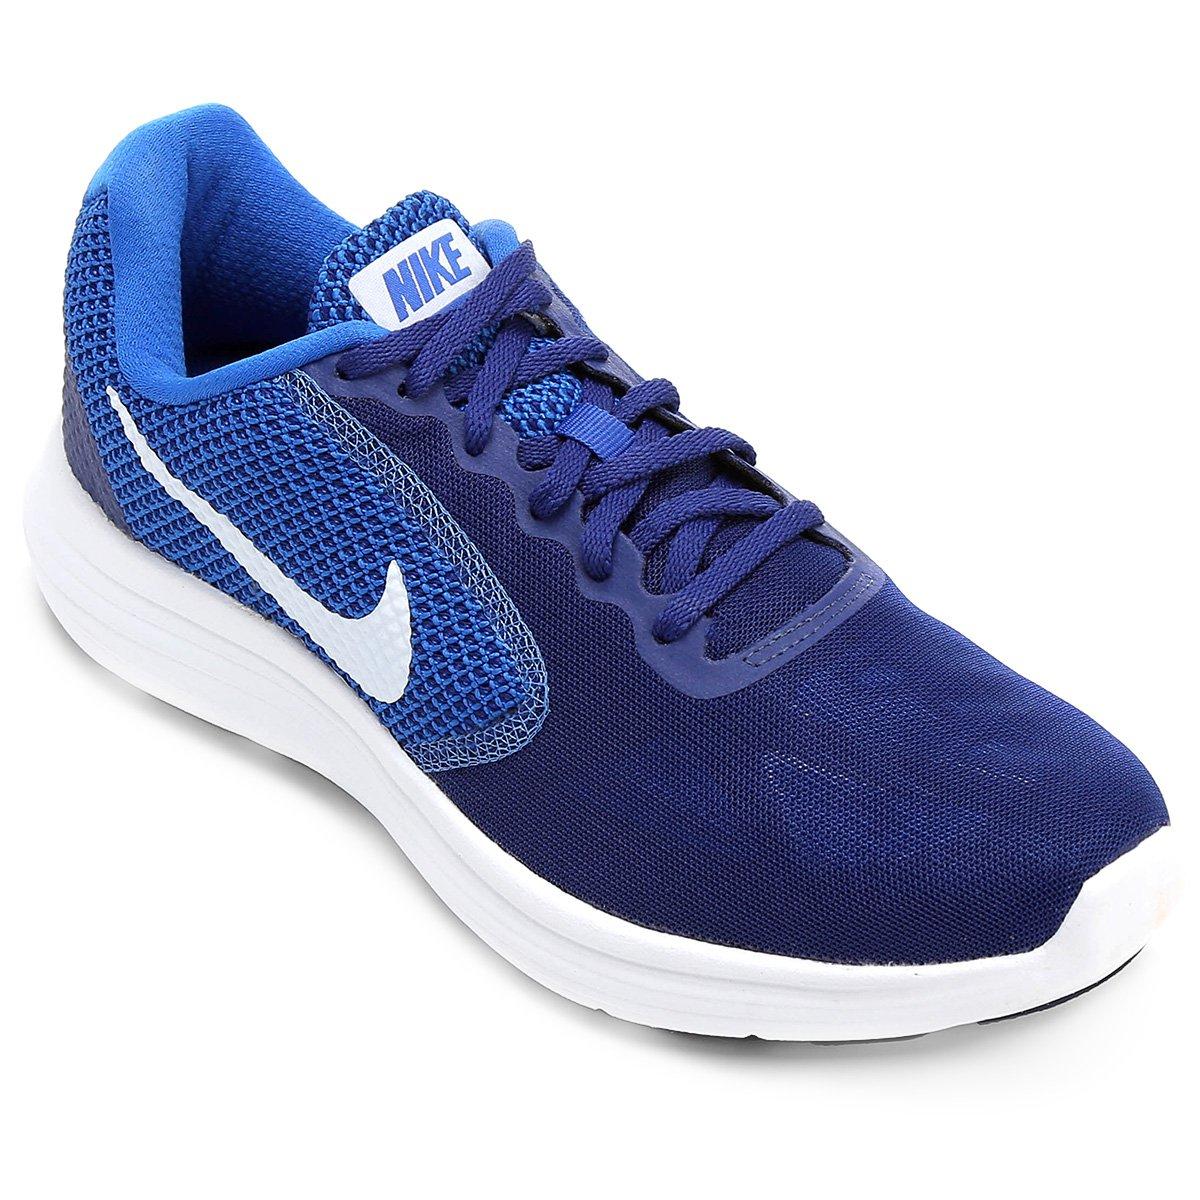 670a23a289 Tênis Nike Revolution 3 Masculino